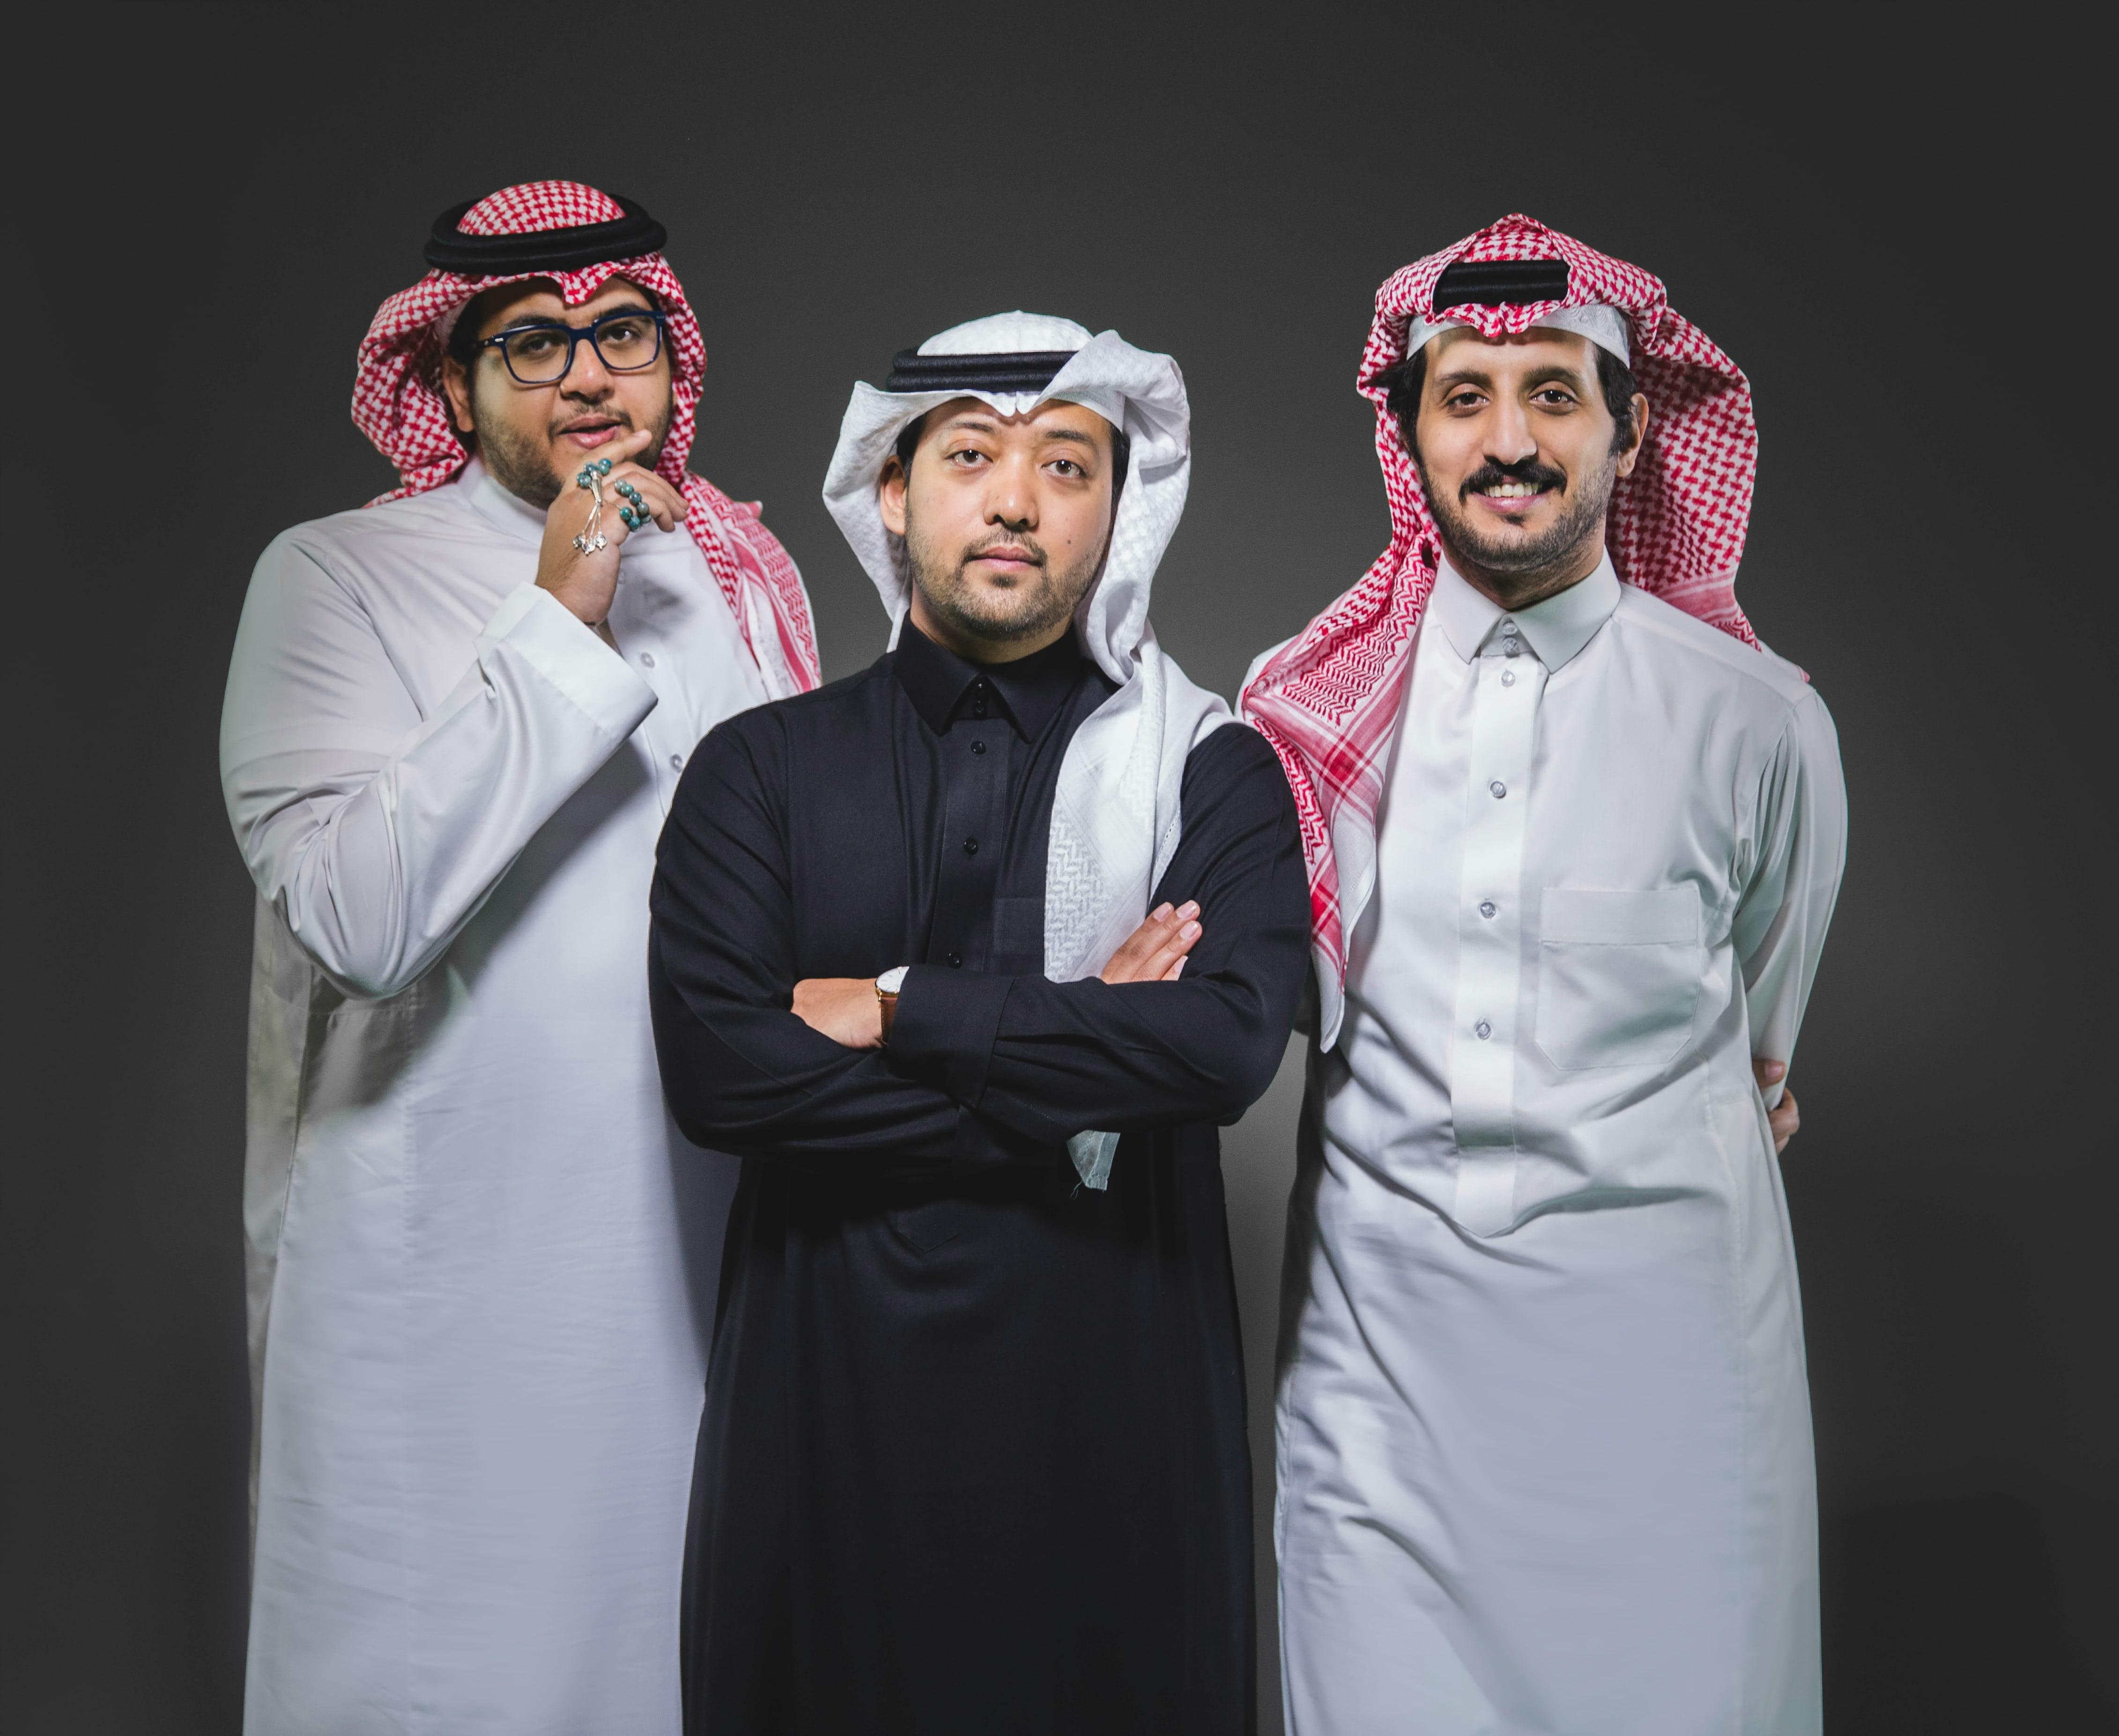 saudi-entertainment-startup-telfaz11-expands-to-dubai